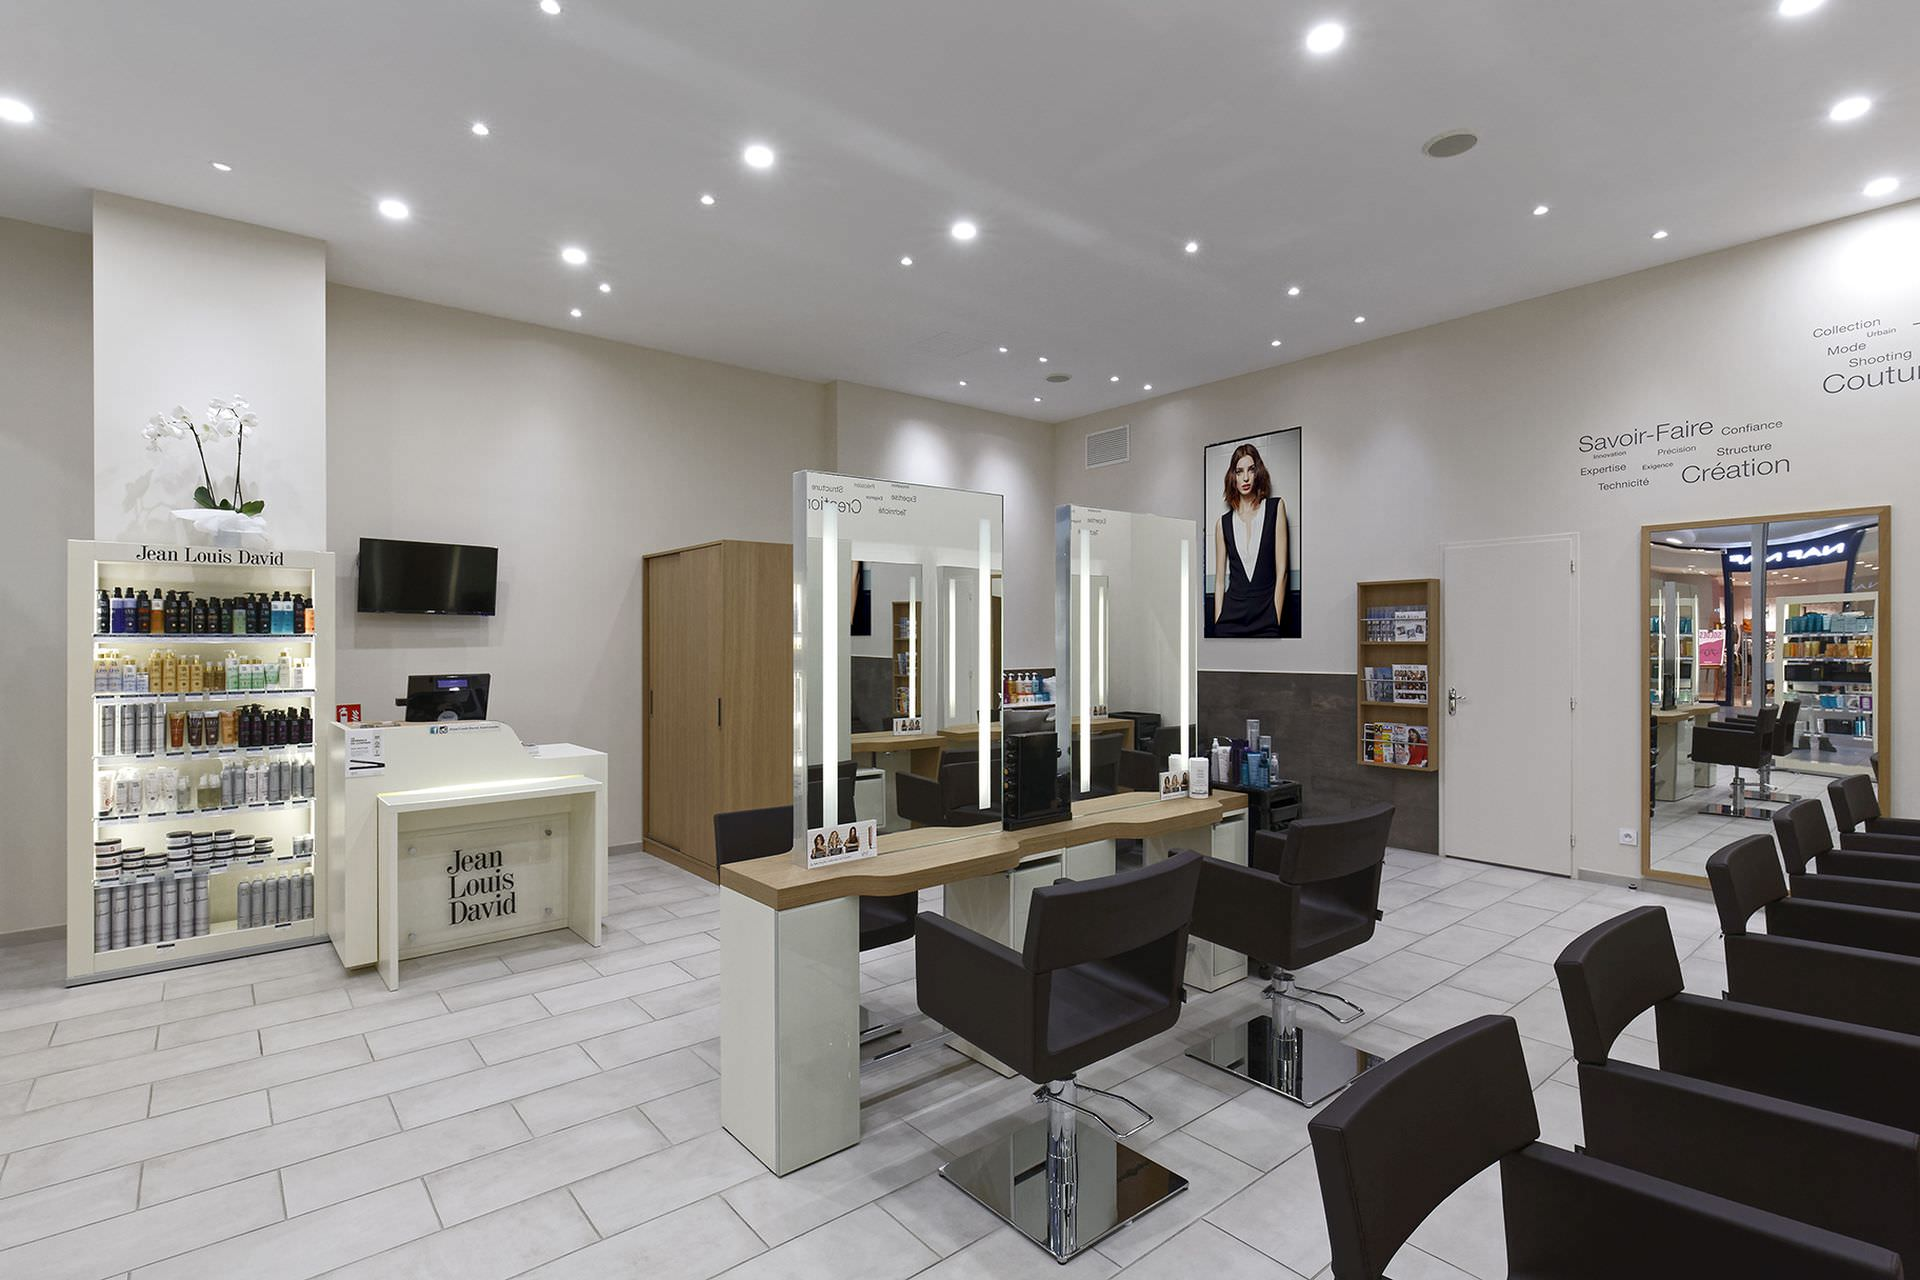 renovation-salon-coiffure-jean-louis-david-001